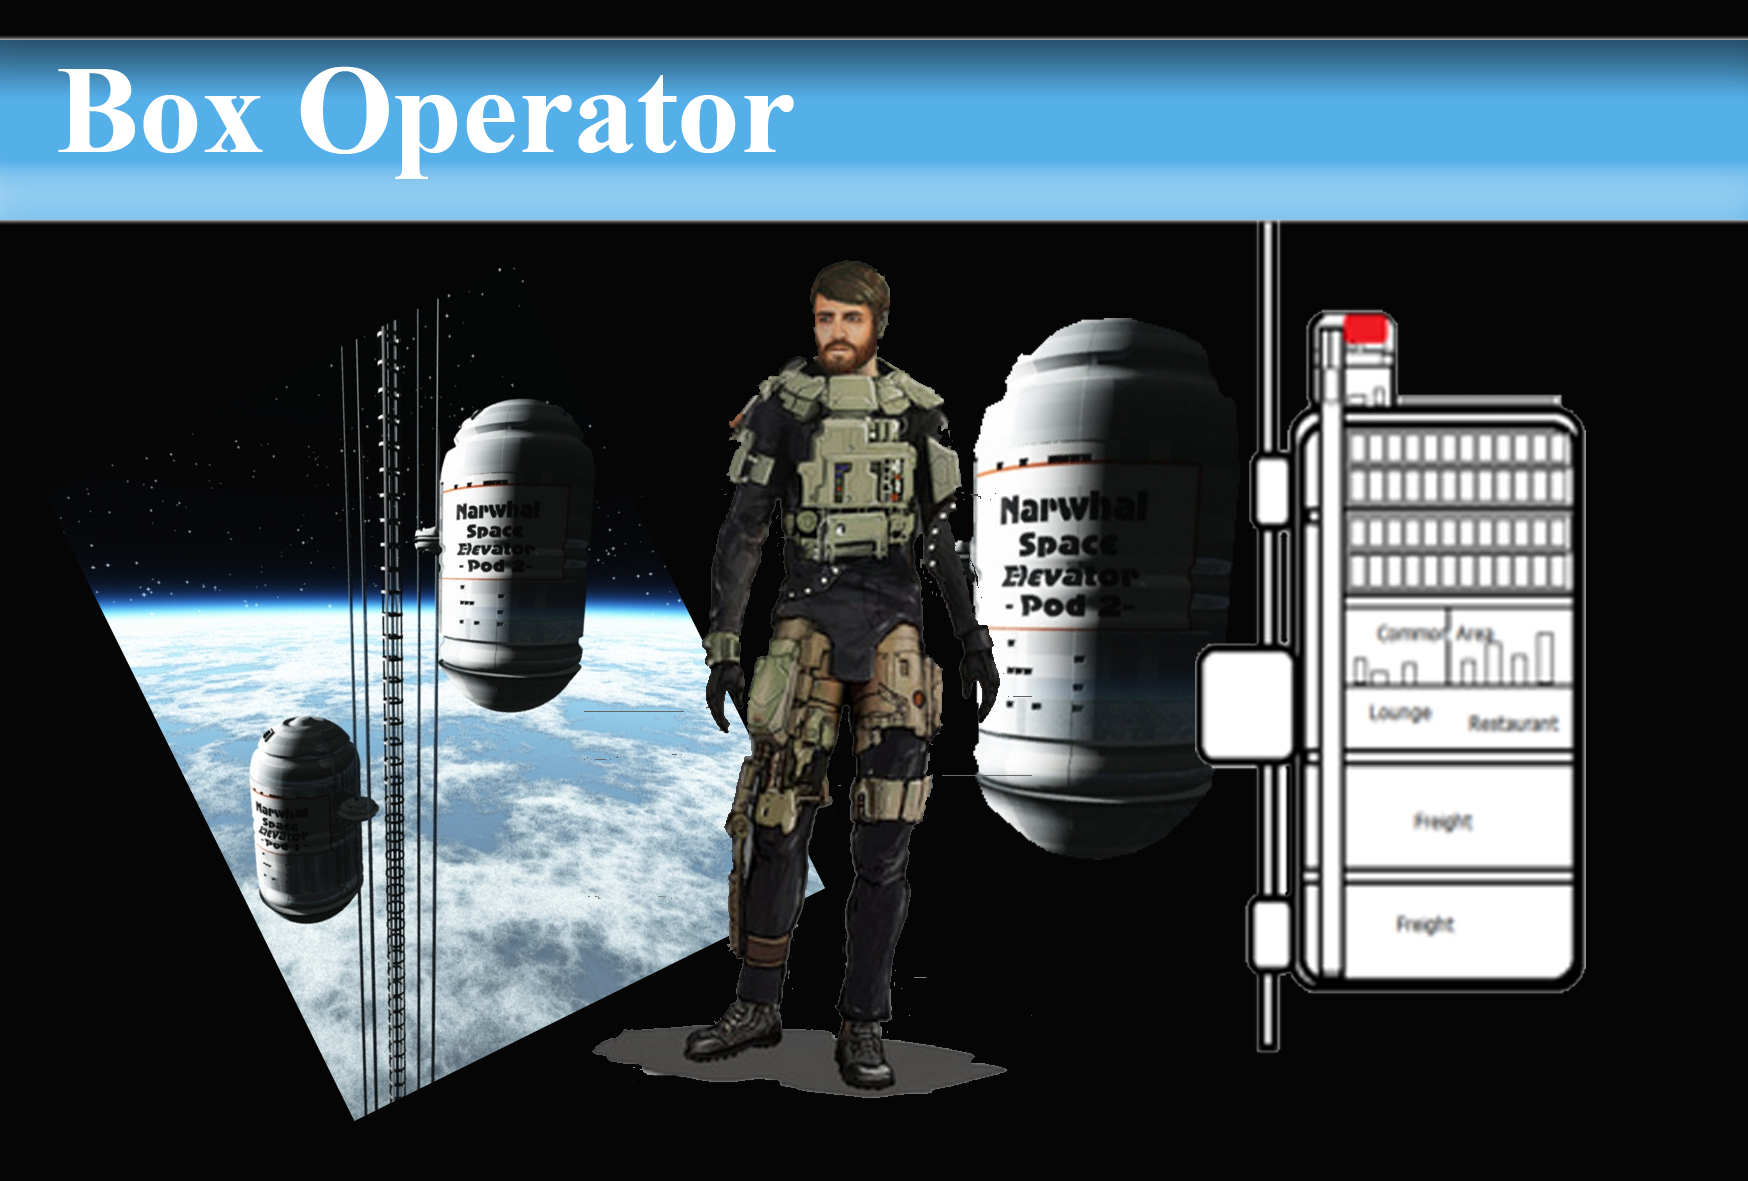 Box Operator